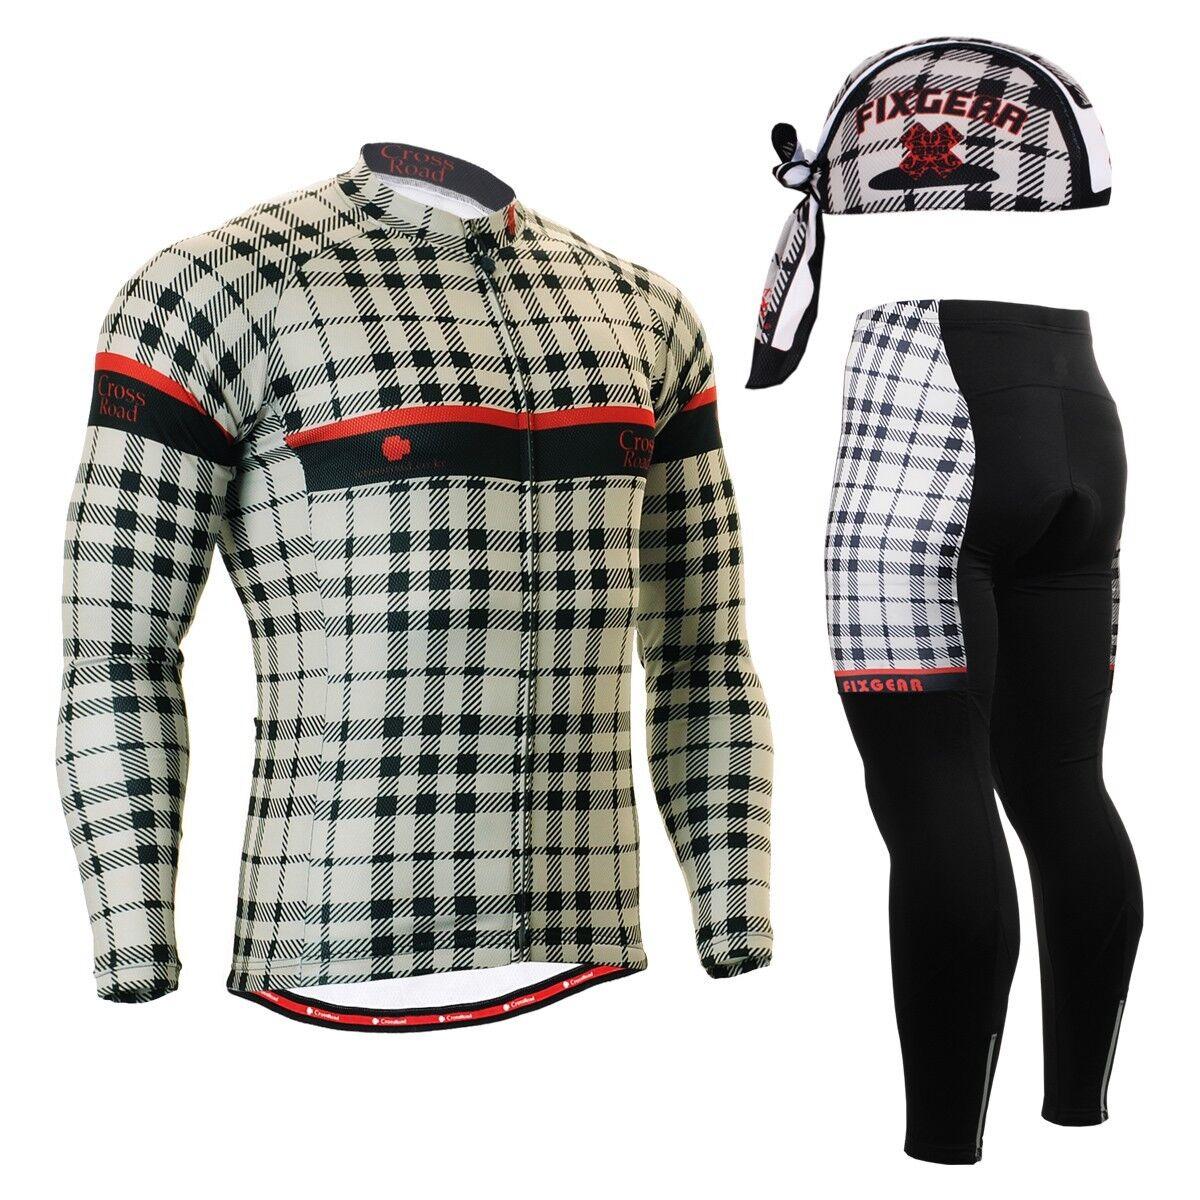 FIXGEAR CS-101 SET Cycling Jersey & Padded Pants,MTB Bike,BMX,Beanie Free Free Bike,BMX,Beanie GIFT eaac94